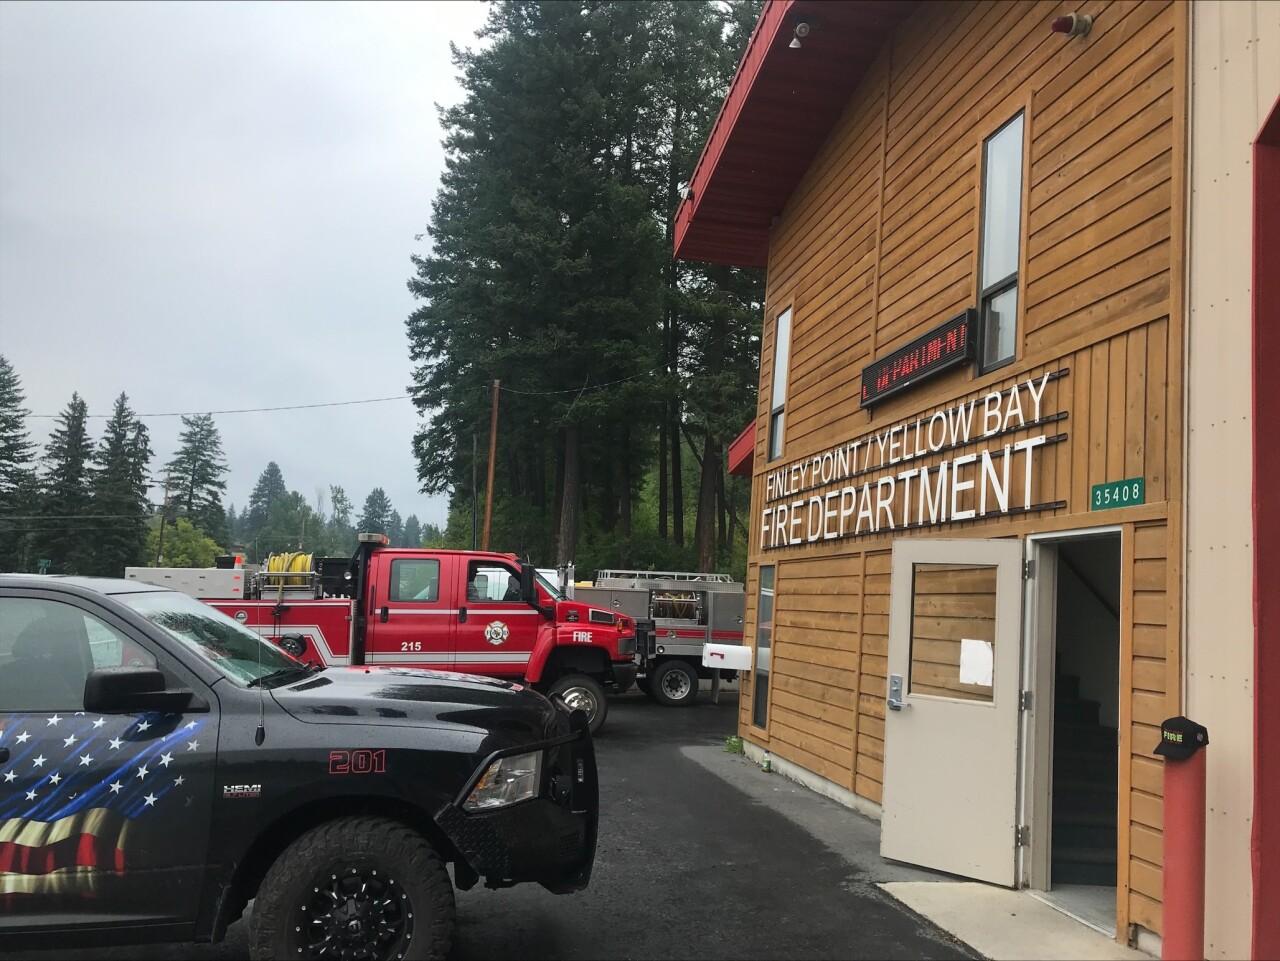 Finley Point Fire Department